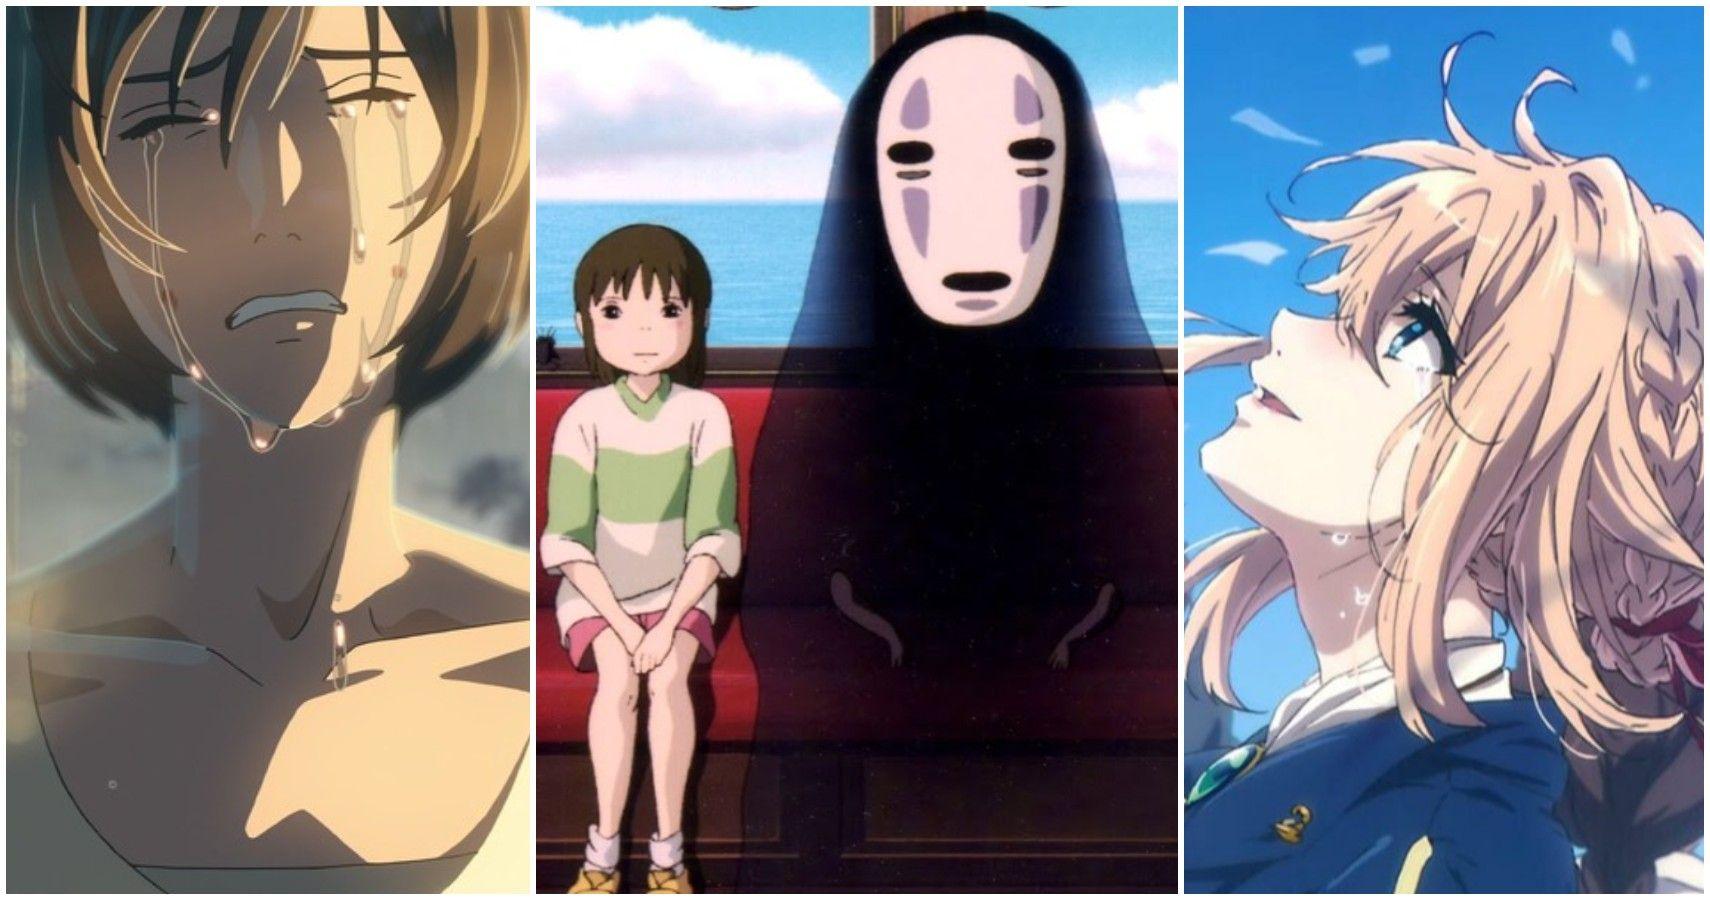 10 Best Animation in Anime Films, According to MyAnimeList